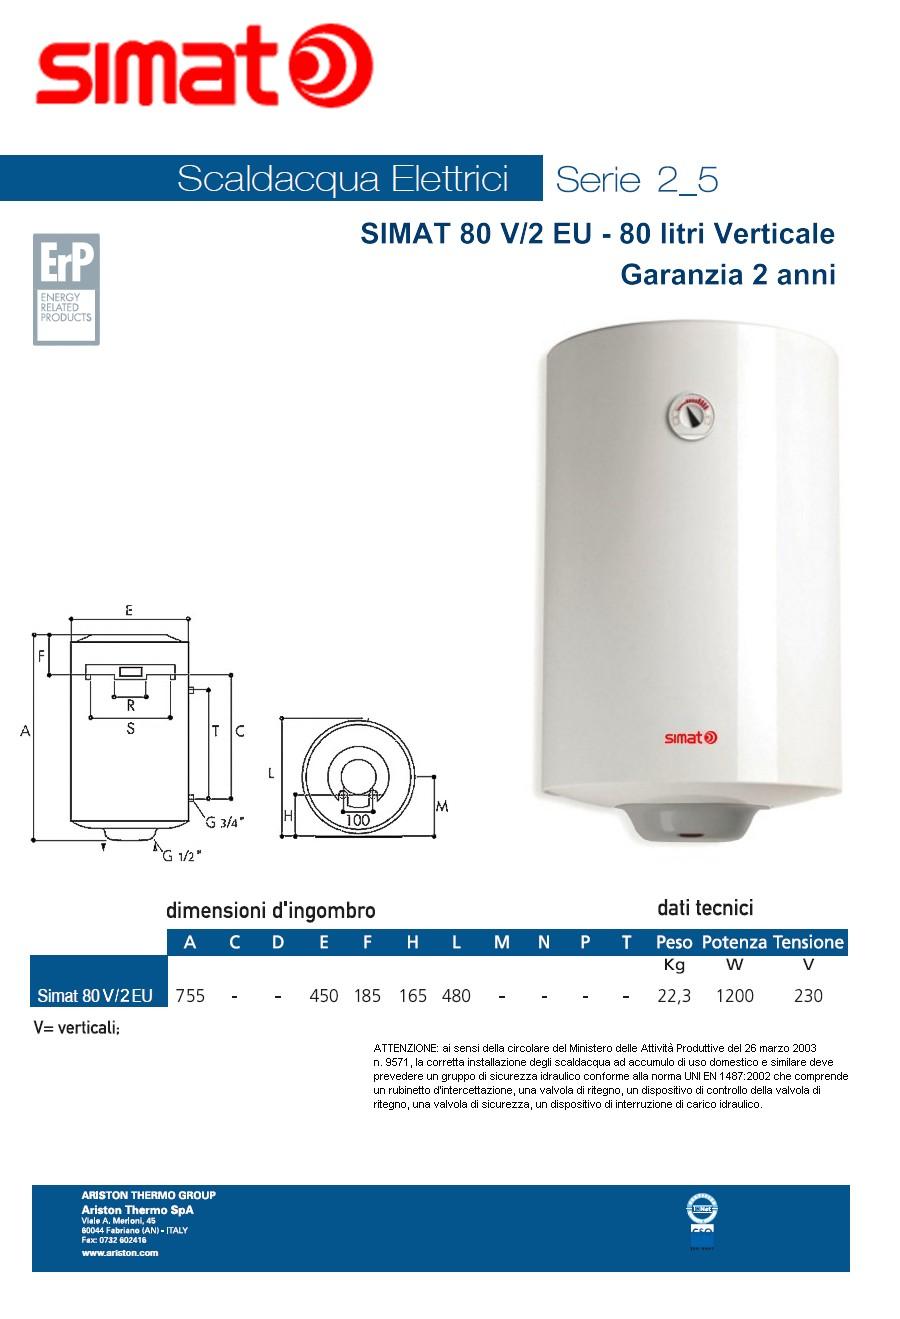 Scaldabagno elettrico simat by ariston 80 litri verticale - Scaldabagno elettrico 50 litri classe a ...